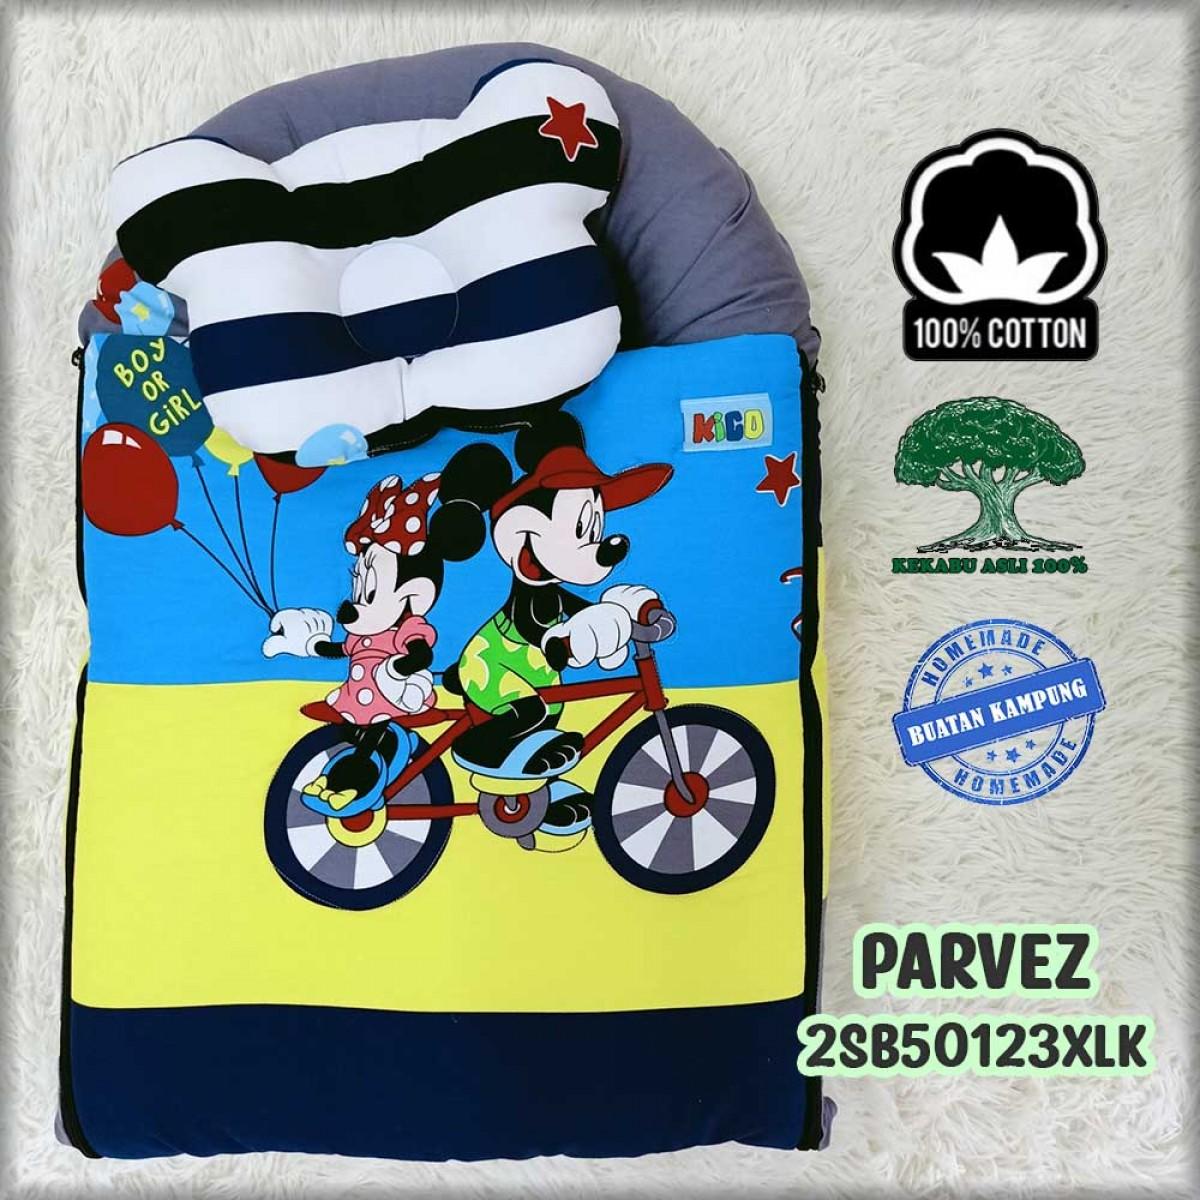 Parvez - Kico Baby Center